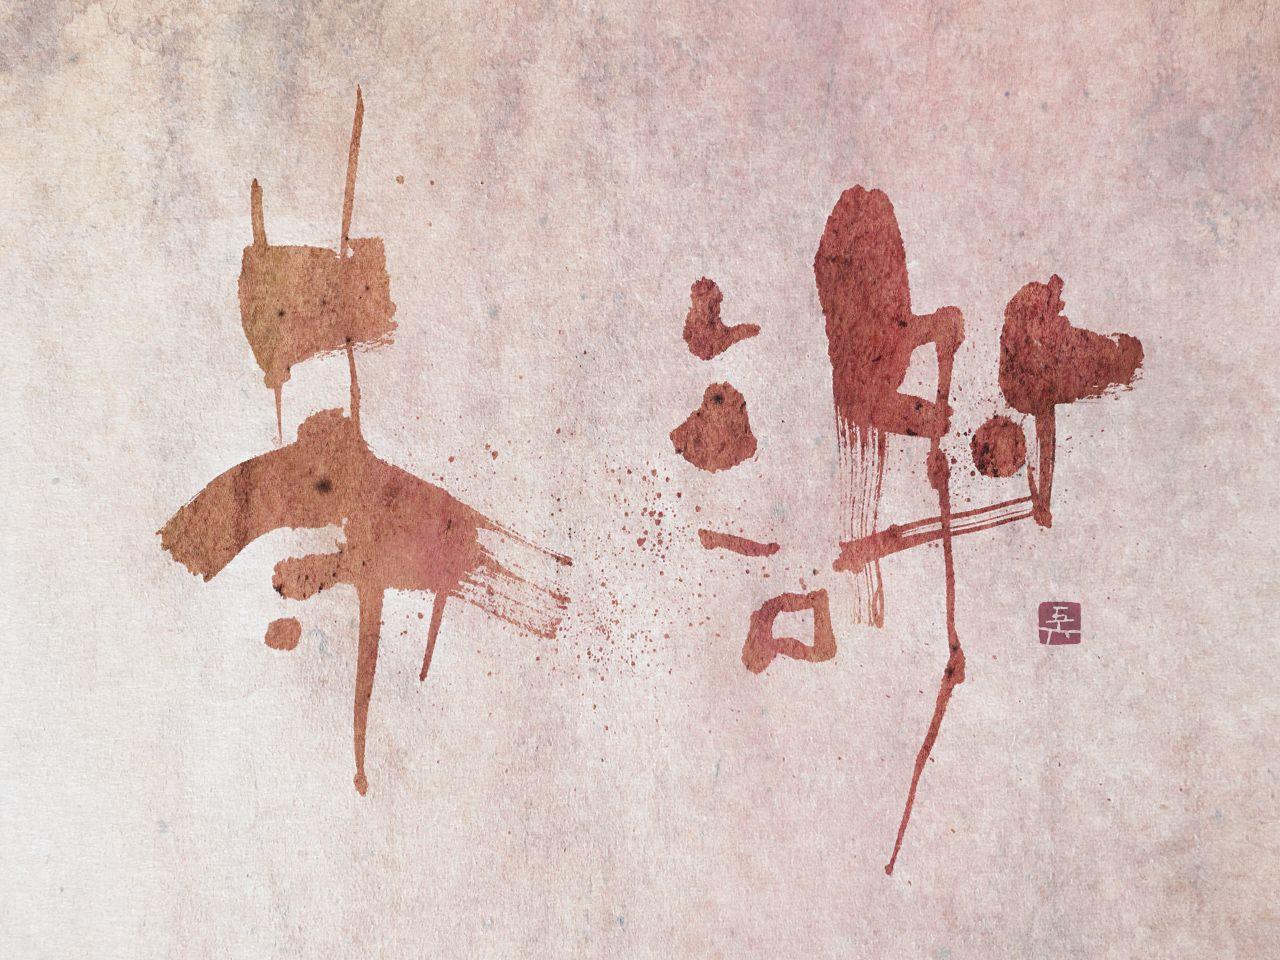 謝茶 禅語 禅書 書道作品 zen zenwords calligraphy